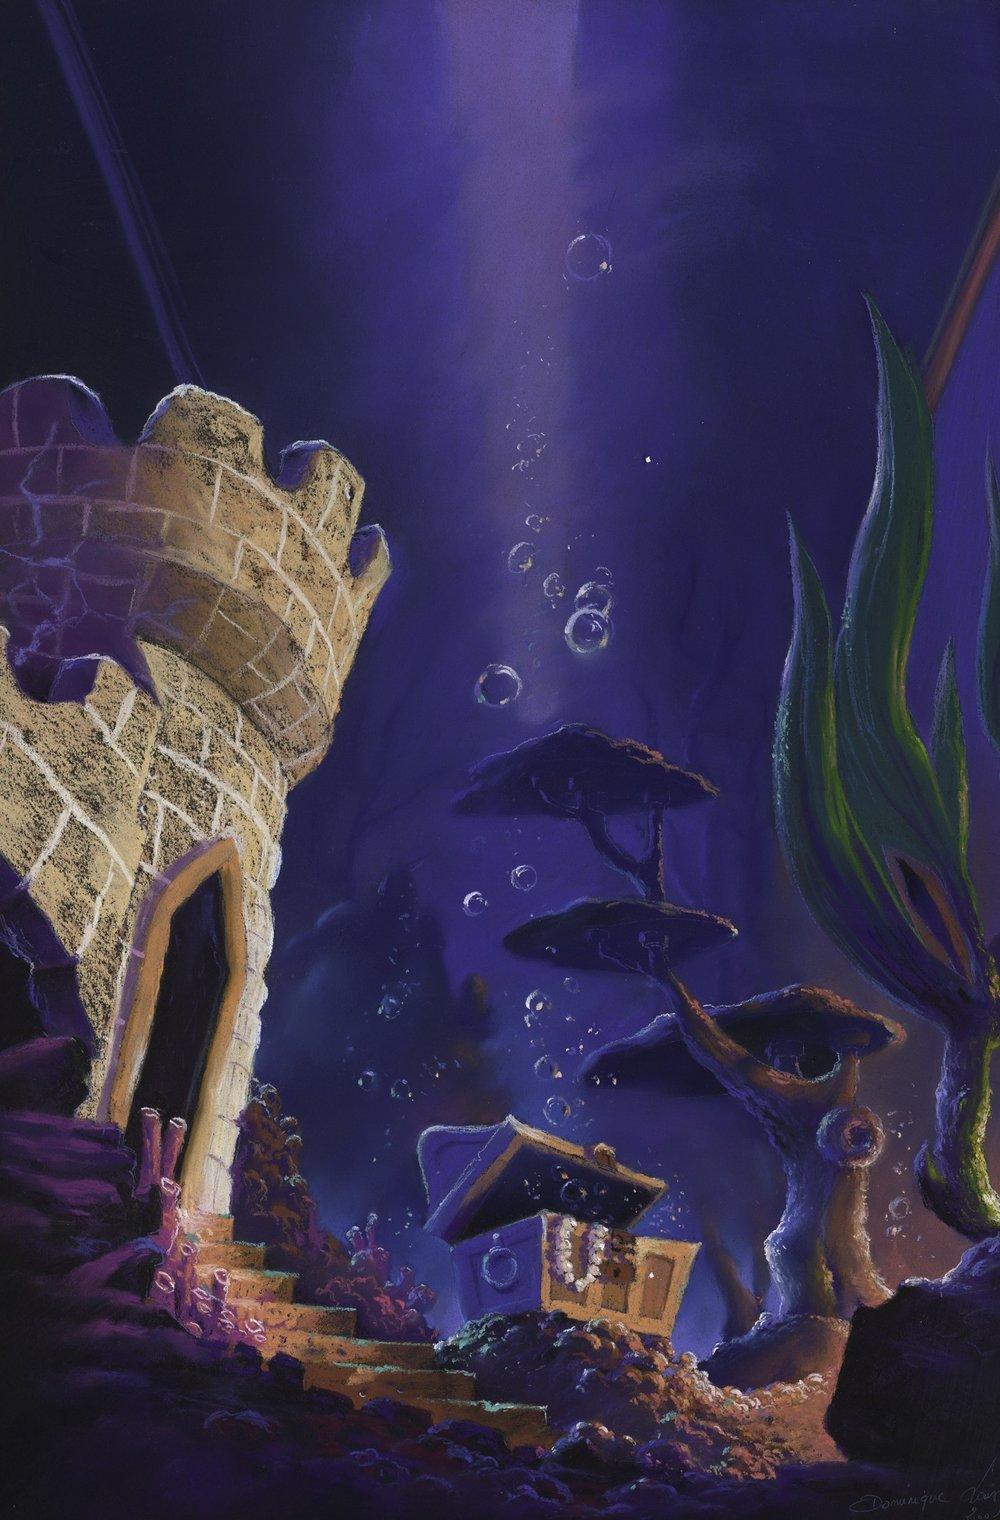 Finding-Nemo-Dentist-Office-Tank (1).jpg